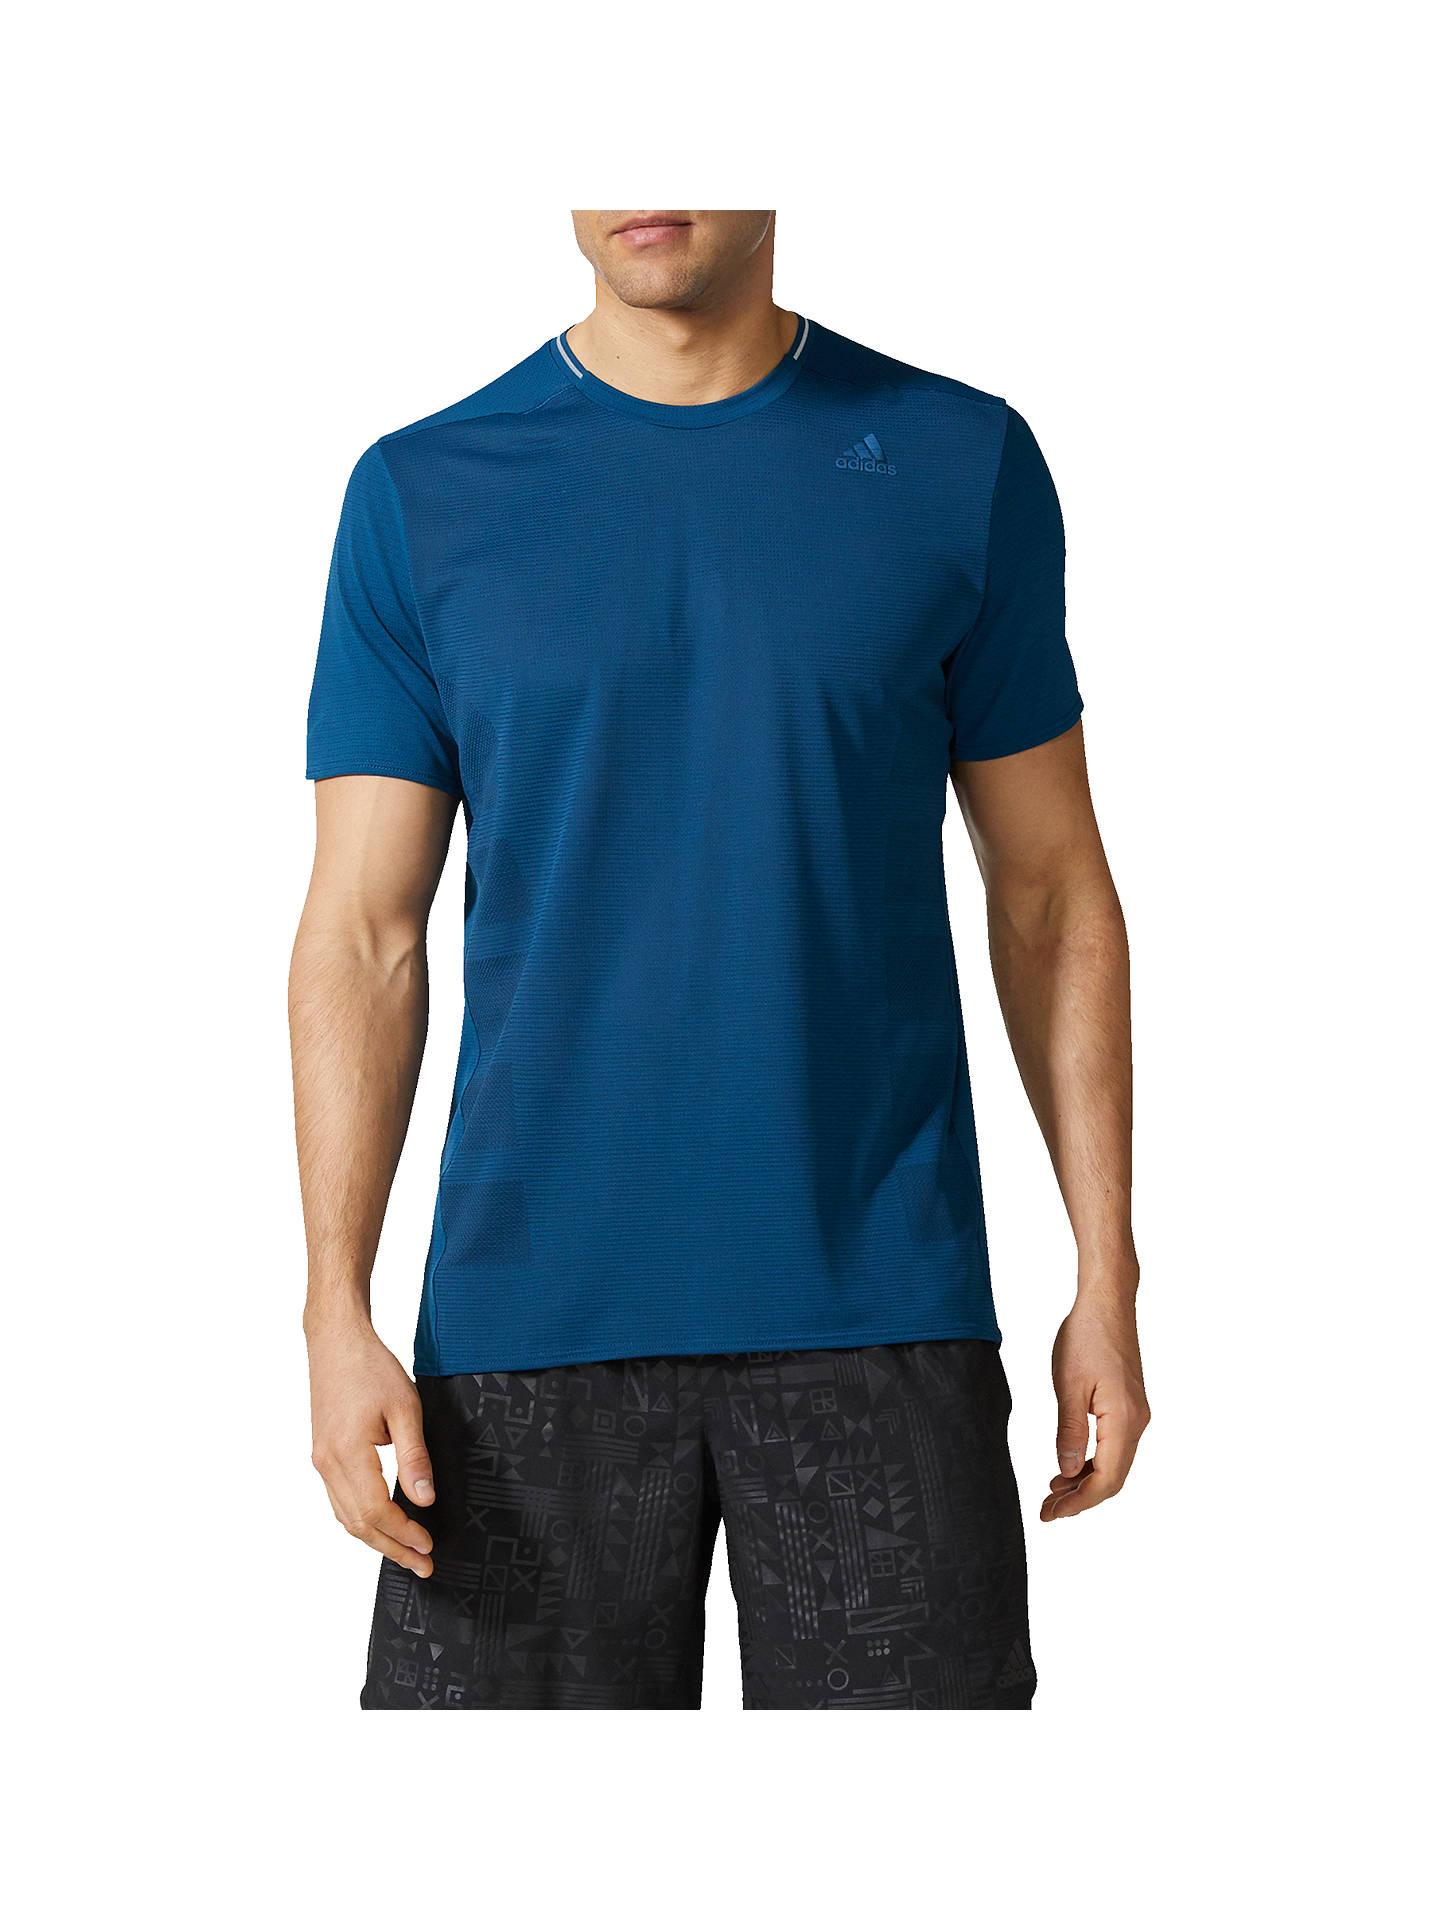 3414ca4c5 adidas Supernova Short Sleeve Running T-Shirt at John Lewis   Partners